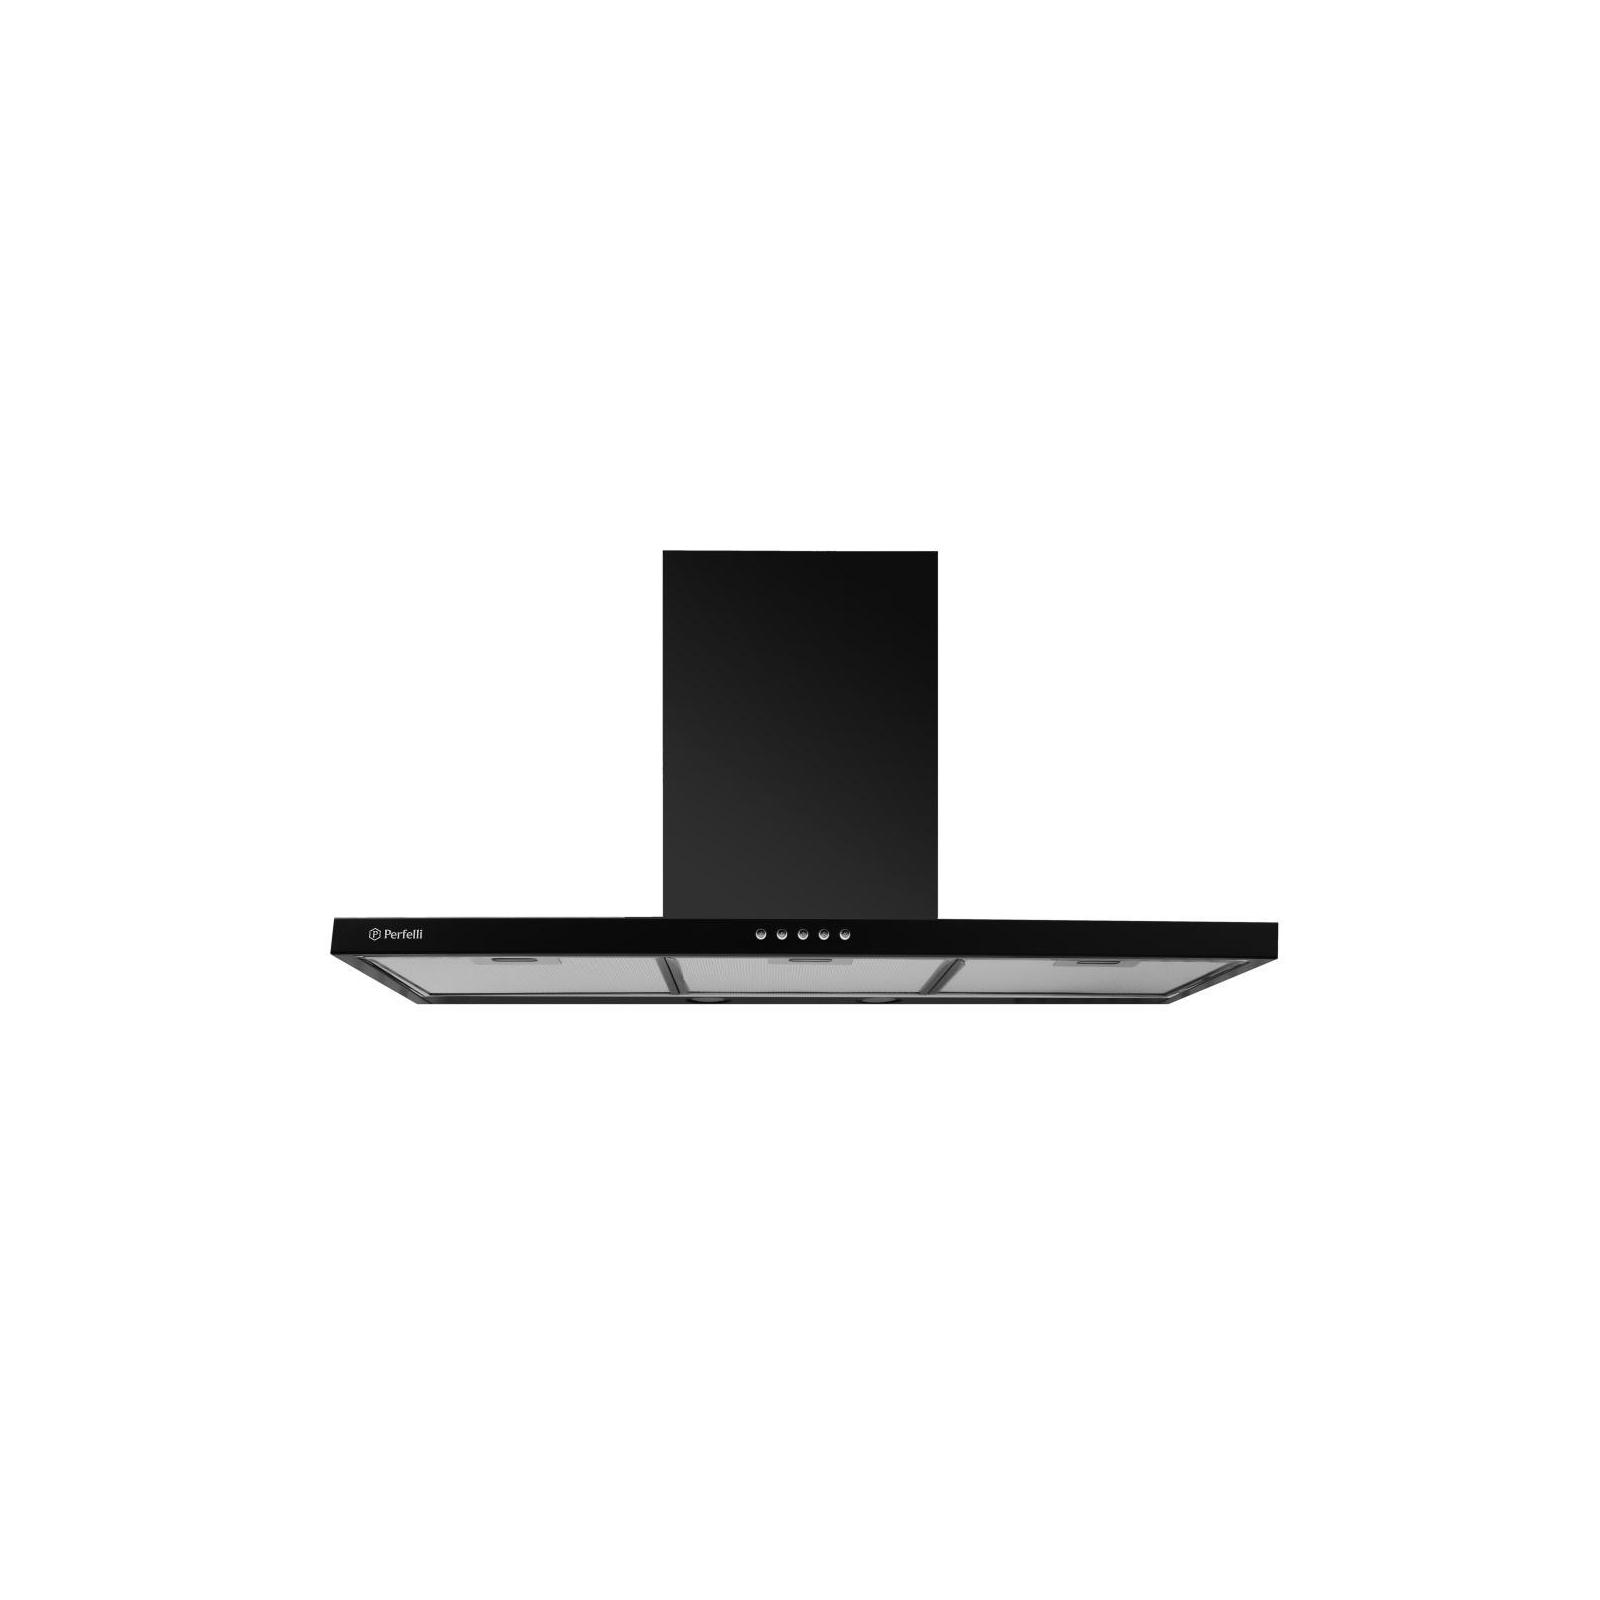 Вытяжка кухонная PERFELLI T 9612 A 1000 BL LED